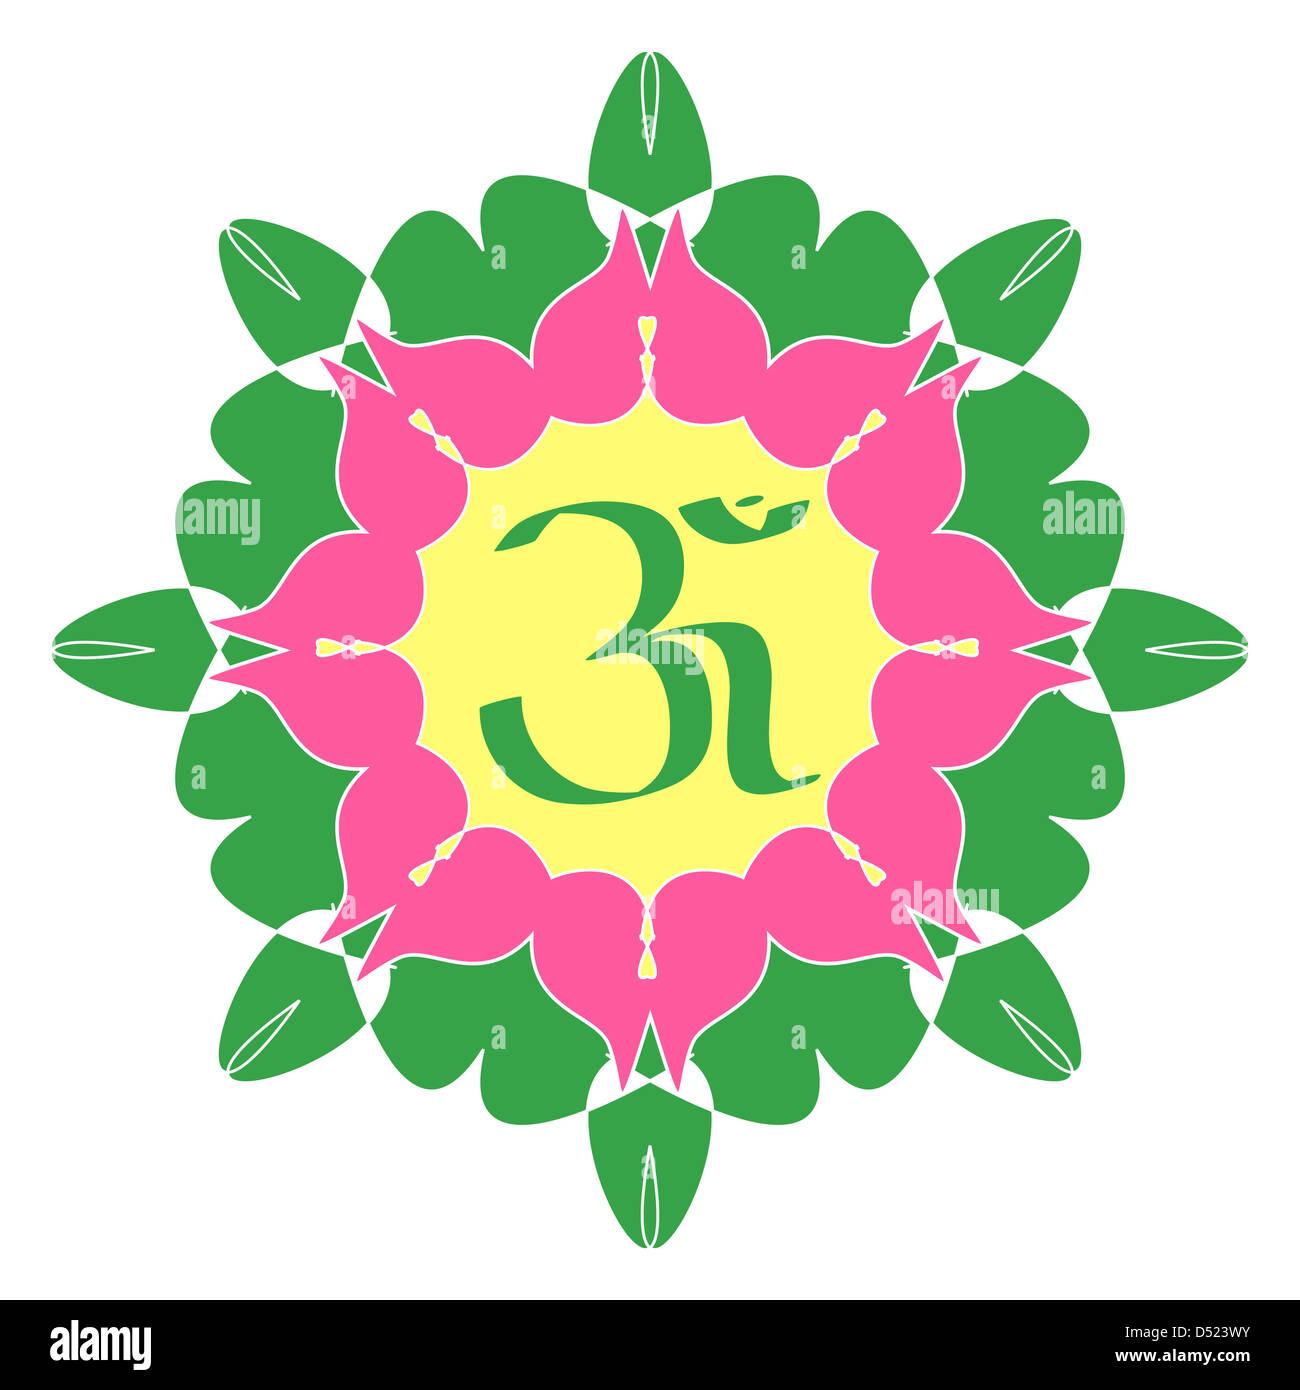 Divine Om Symbol On Artistic Design Stock Photo 54751367 Alamy